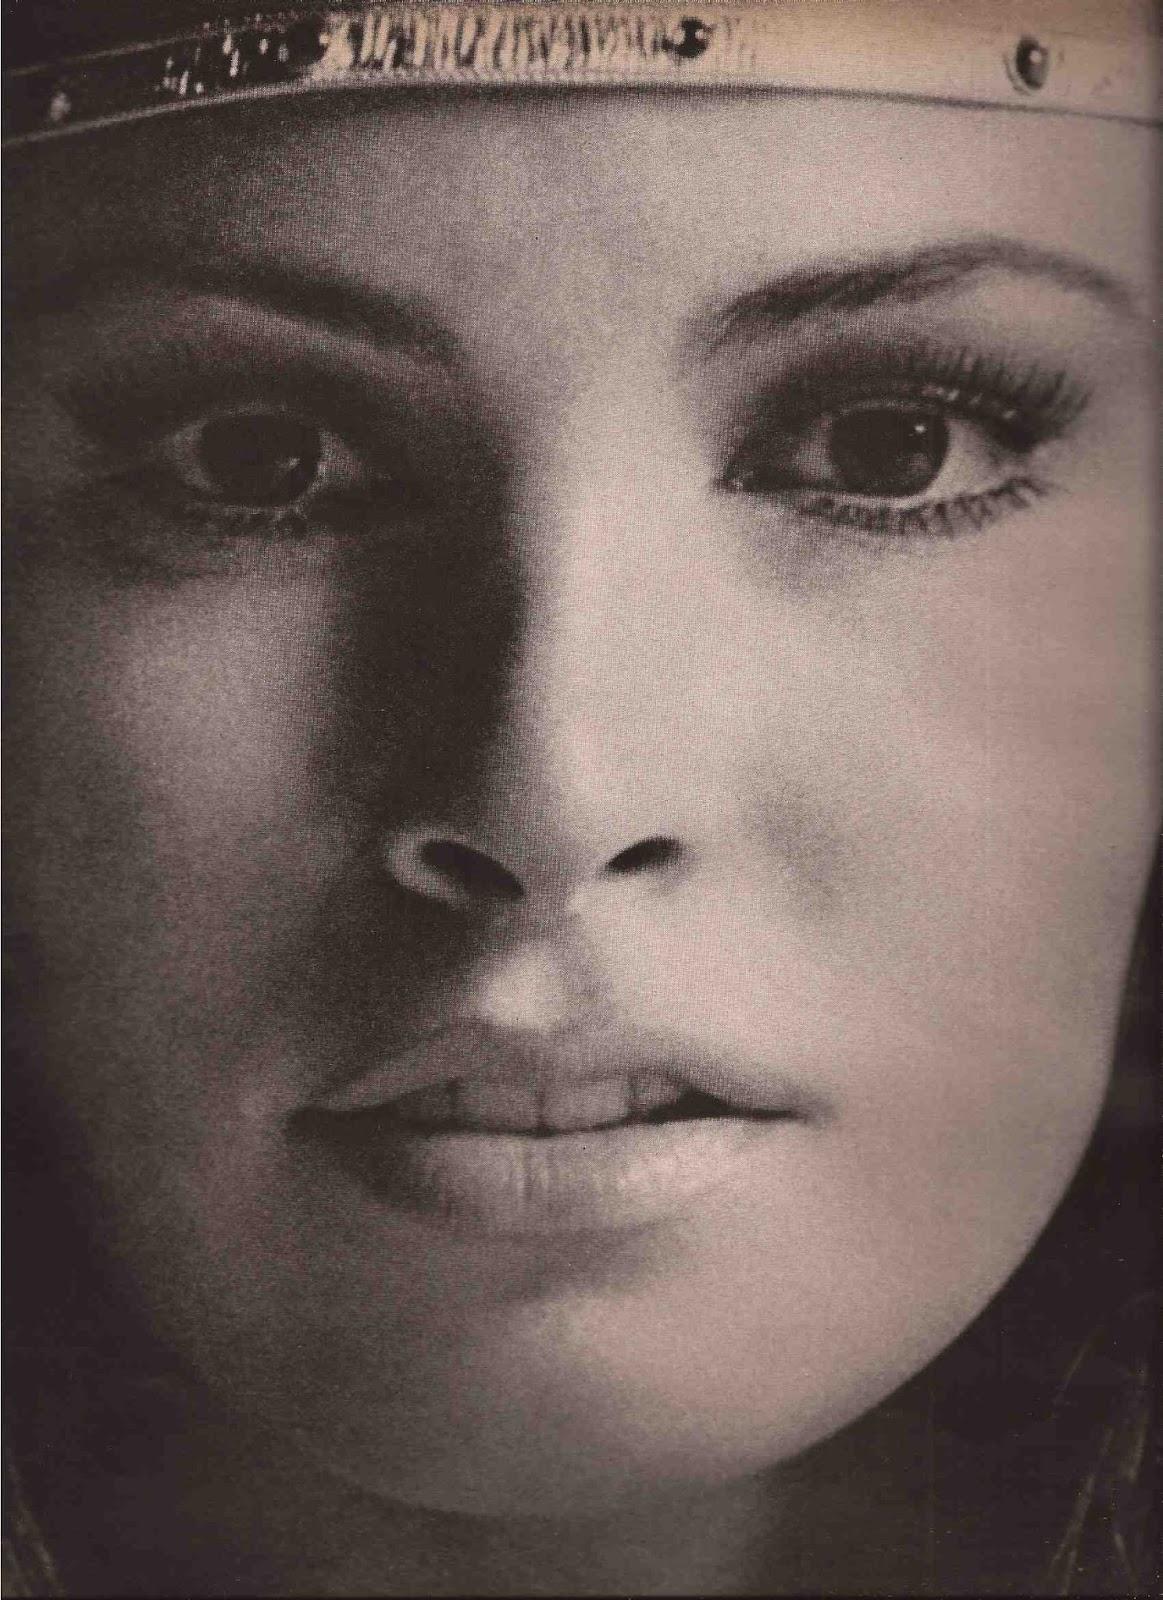 Devodotcom Bert Stern Raquel Welch Candice Bergen 1969